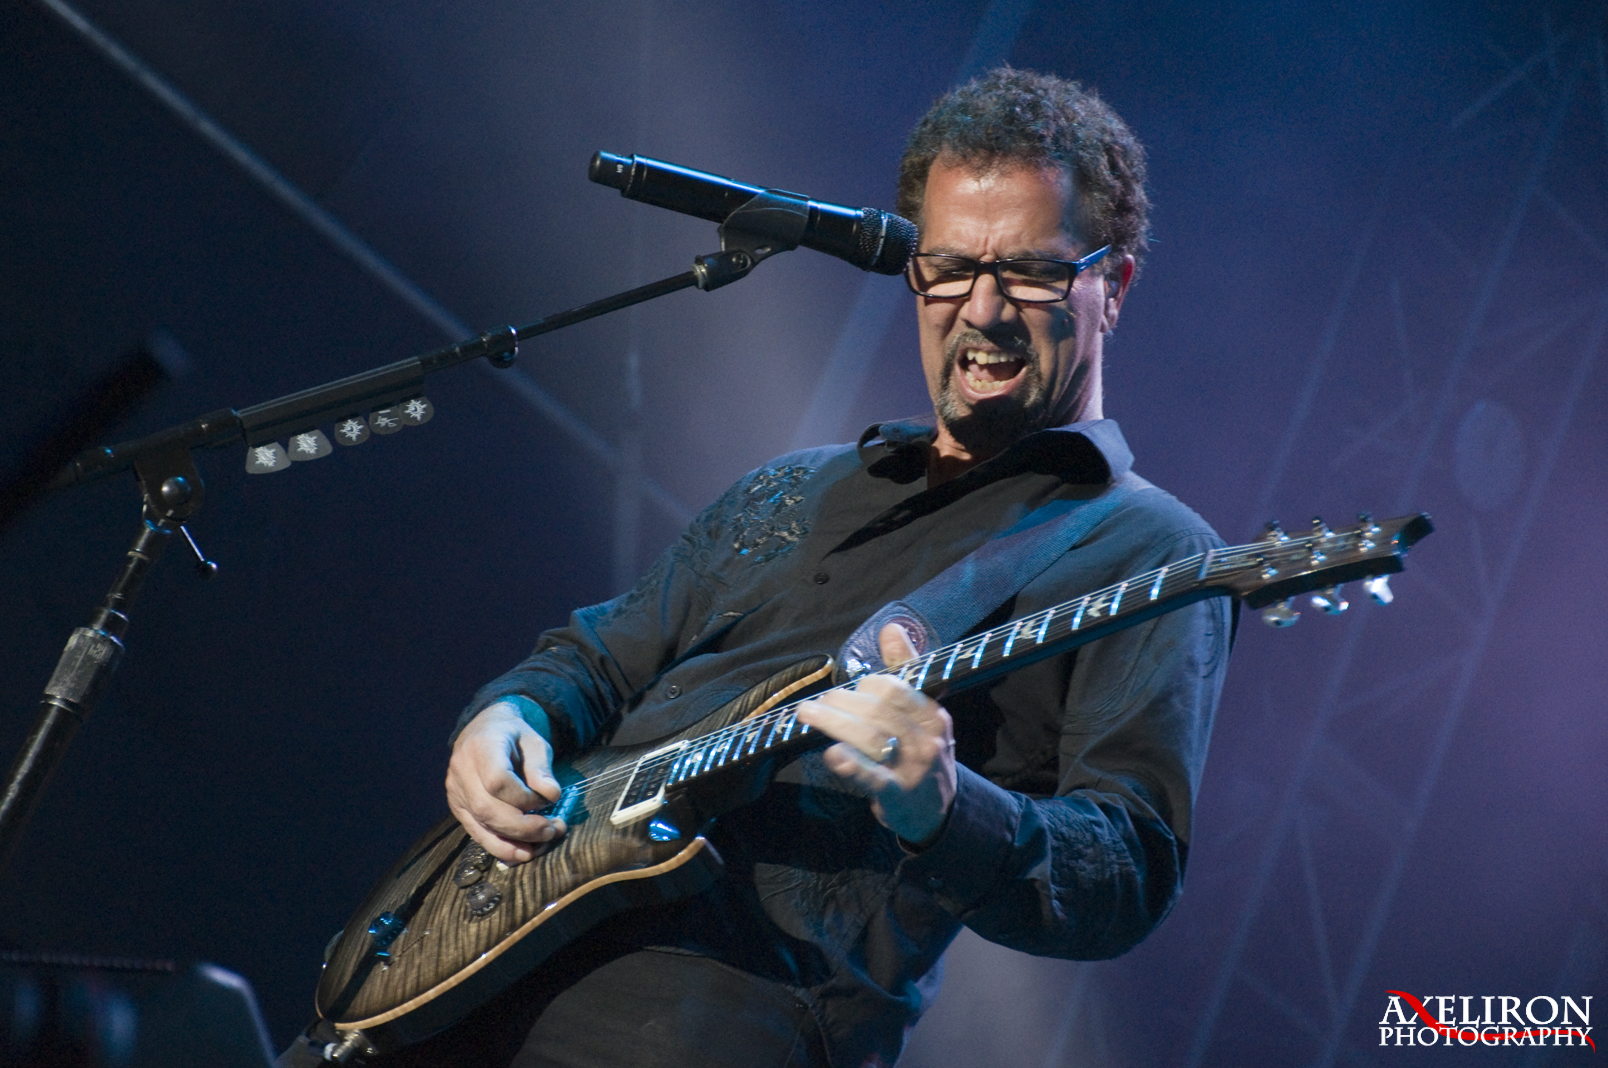 Godsmack Postpone Euro Tour Following Death of Guitarist's Son